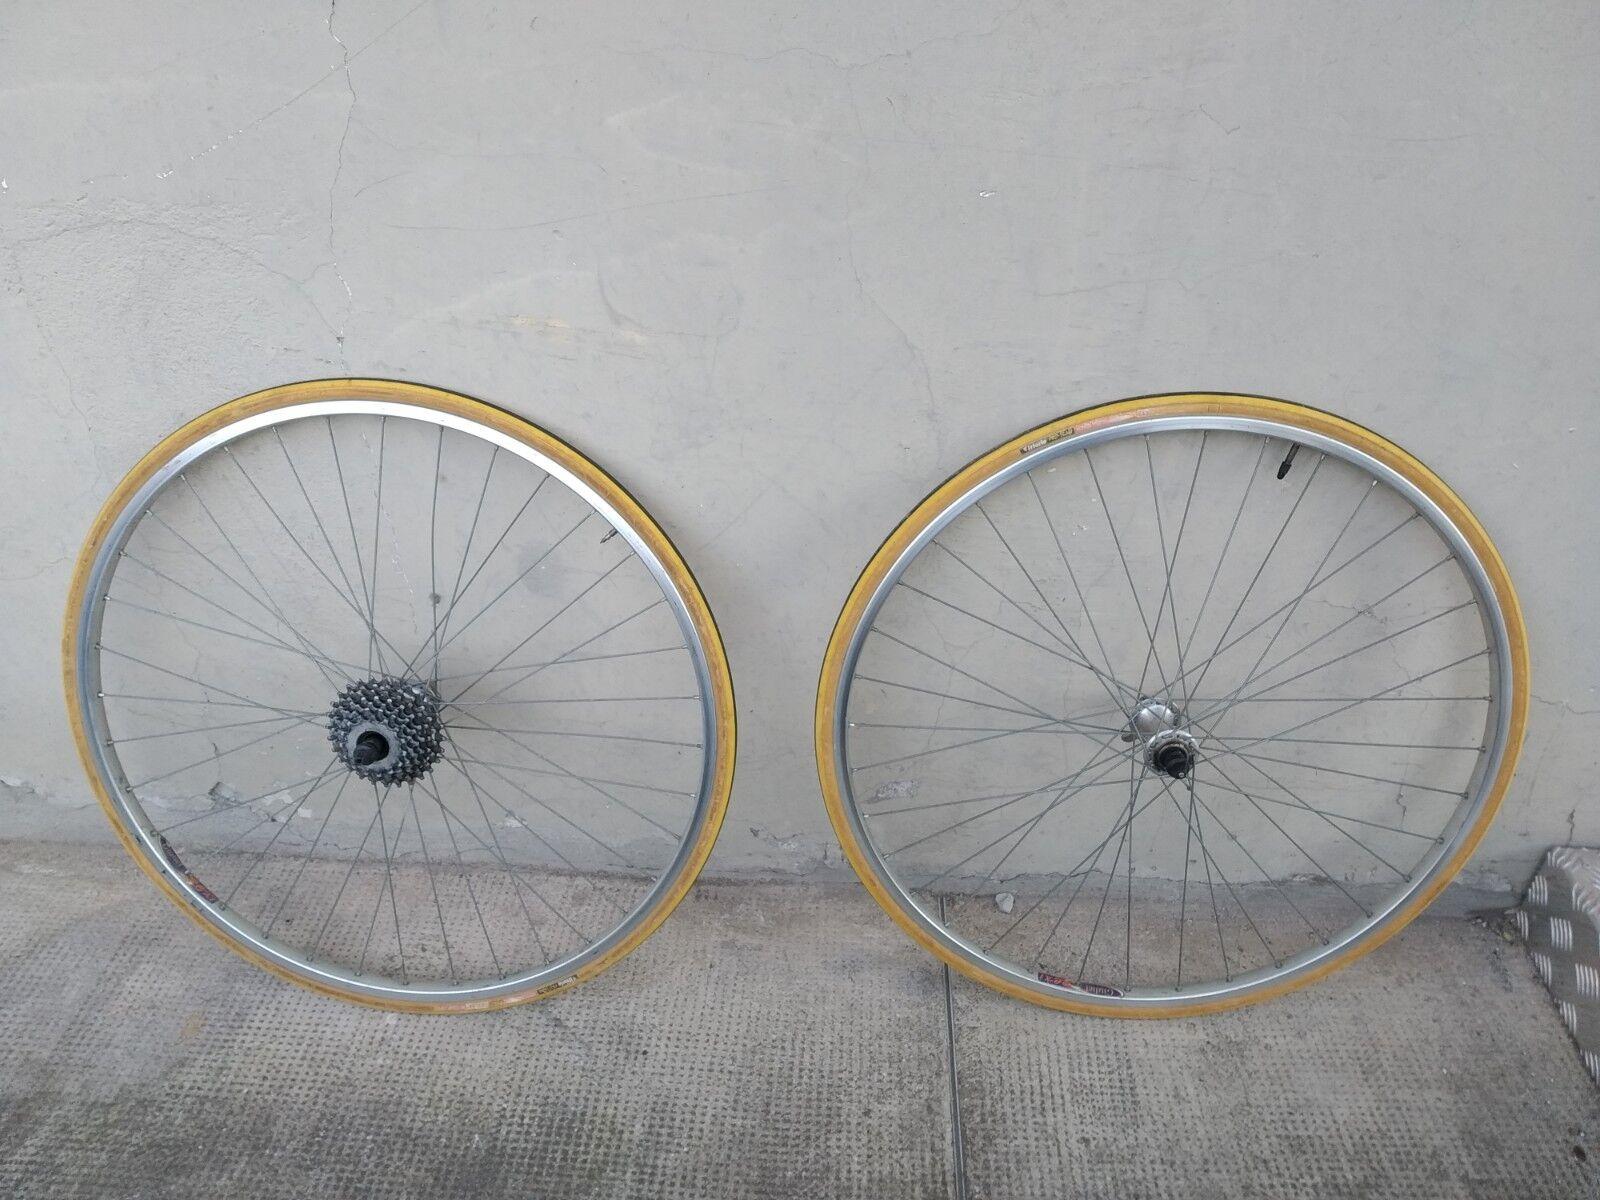 Ruote   vintage corsa  28   eroica  wheels  miche giuliet